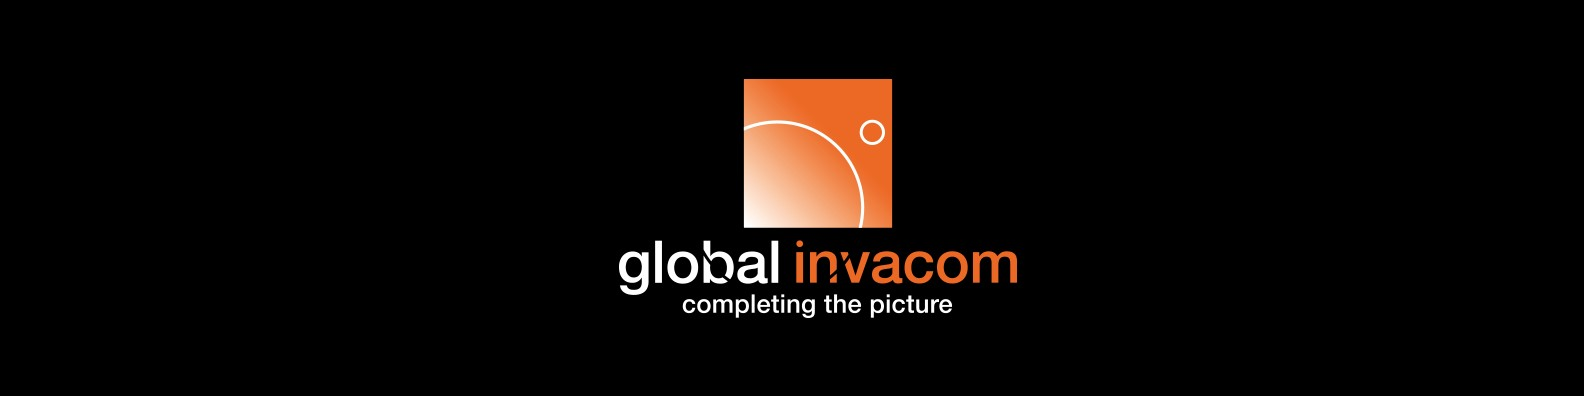 Global Invacom Satellite TV Fibre